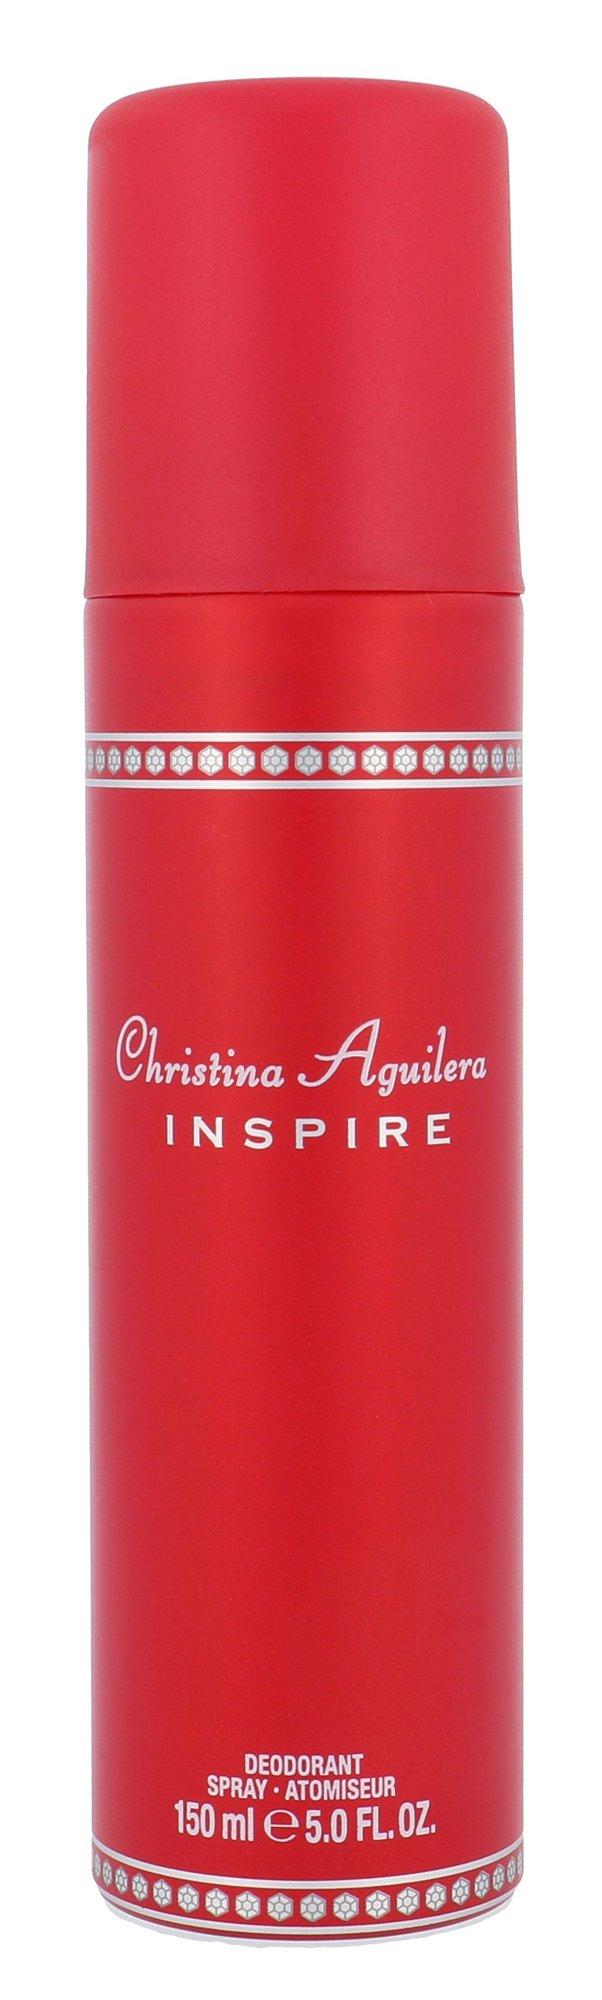 Christina Aguilera Inspire Deodorant 150ml